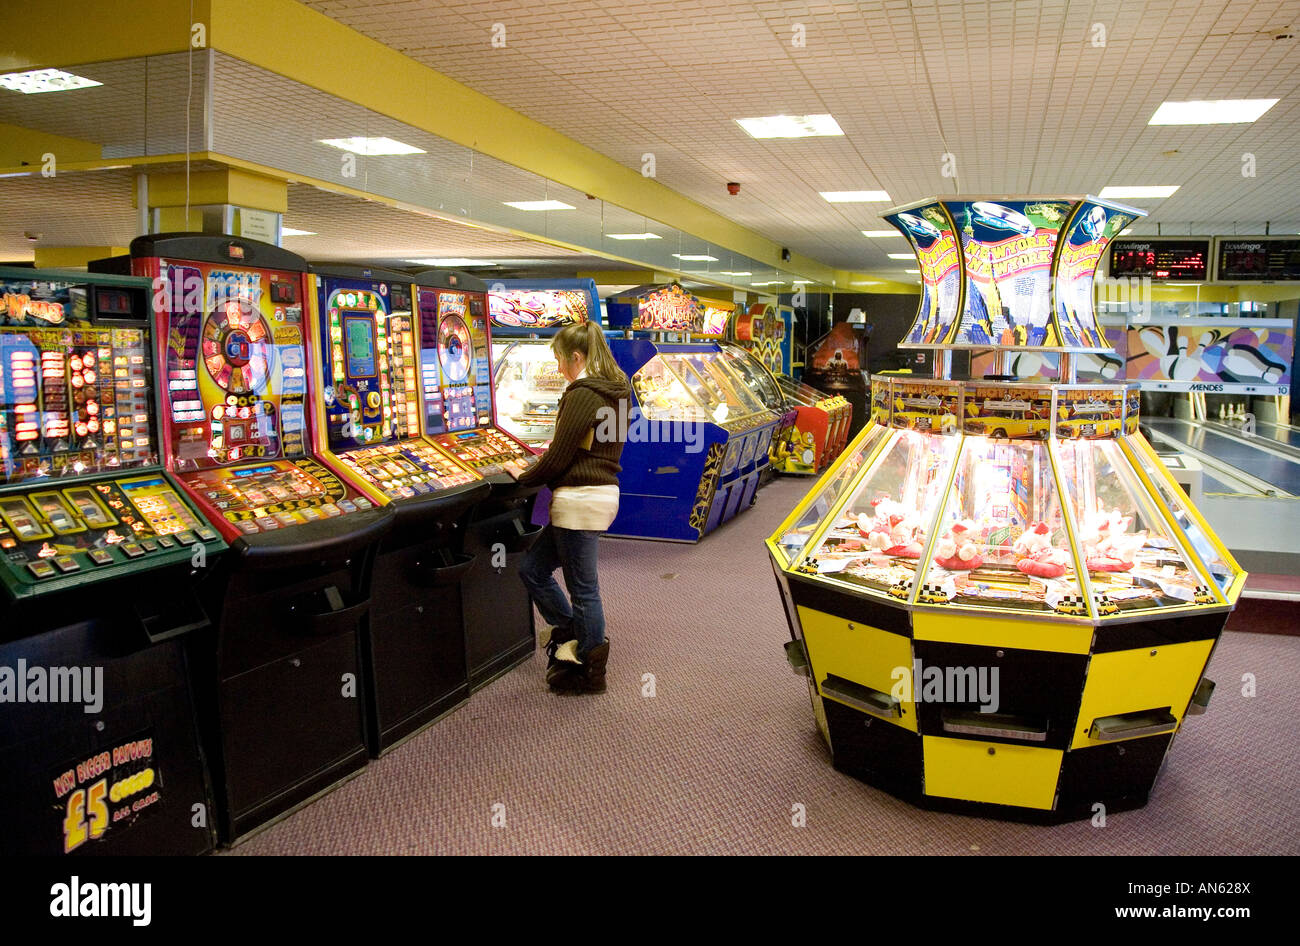 Family amusement arcade - Chilliwack food